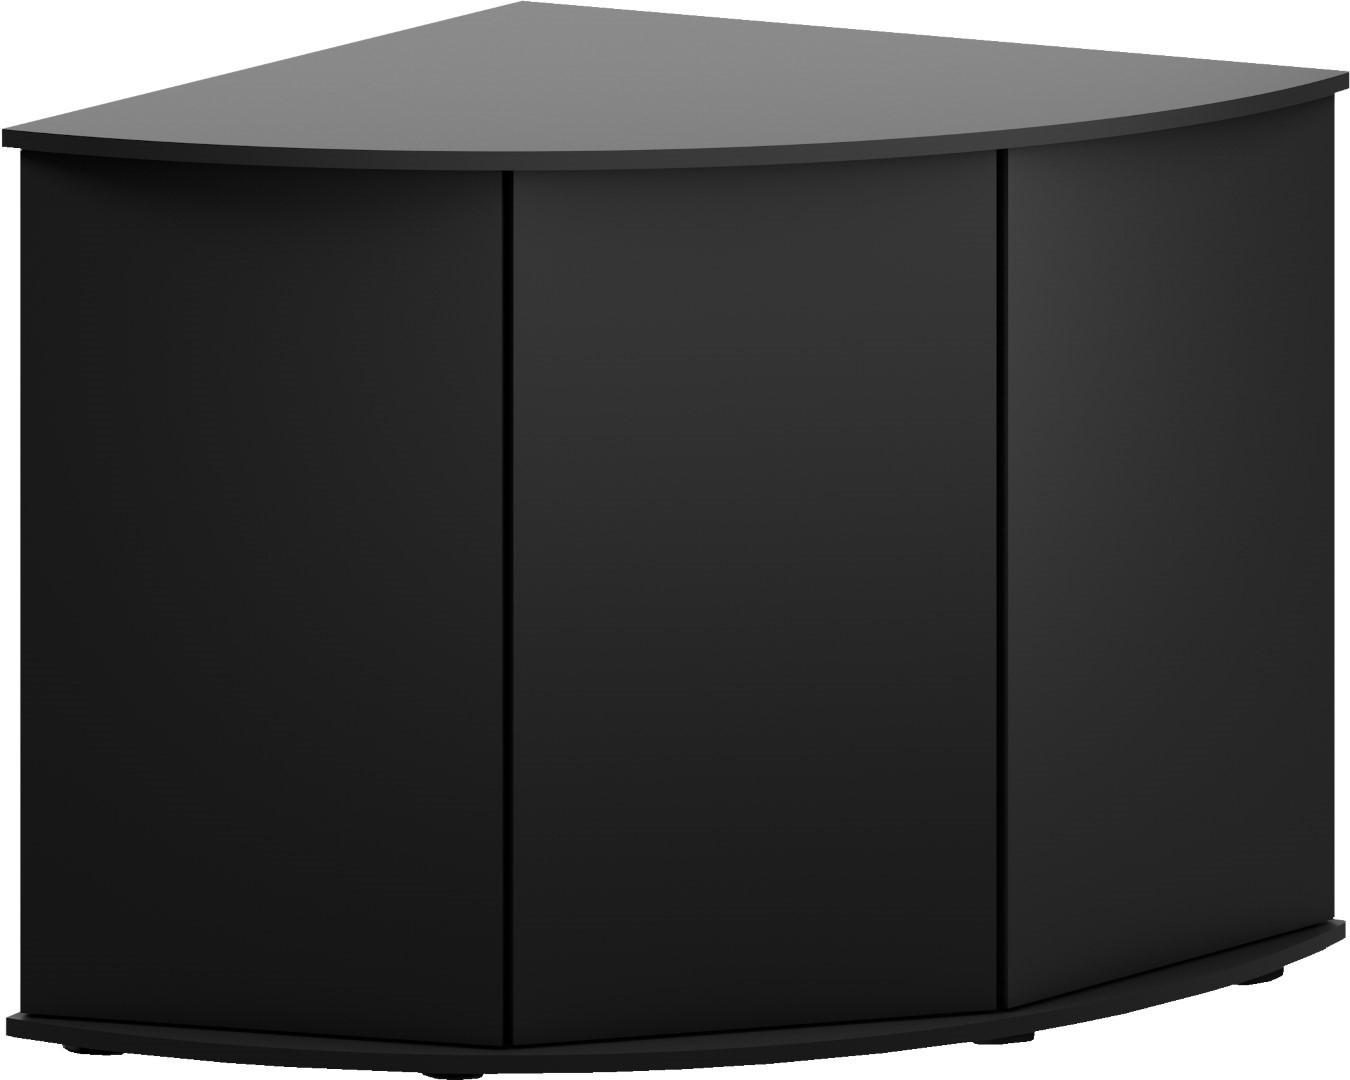 Juwel meubel bouwpakket SBX Trigon 350 zwart